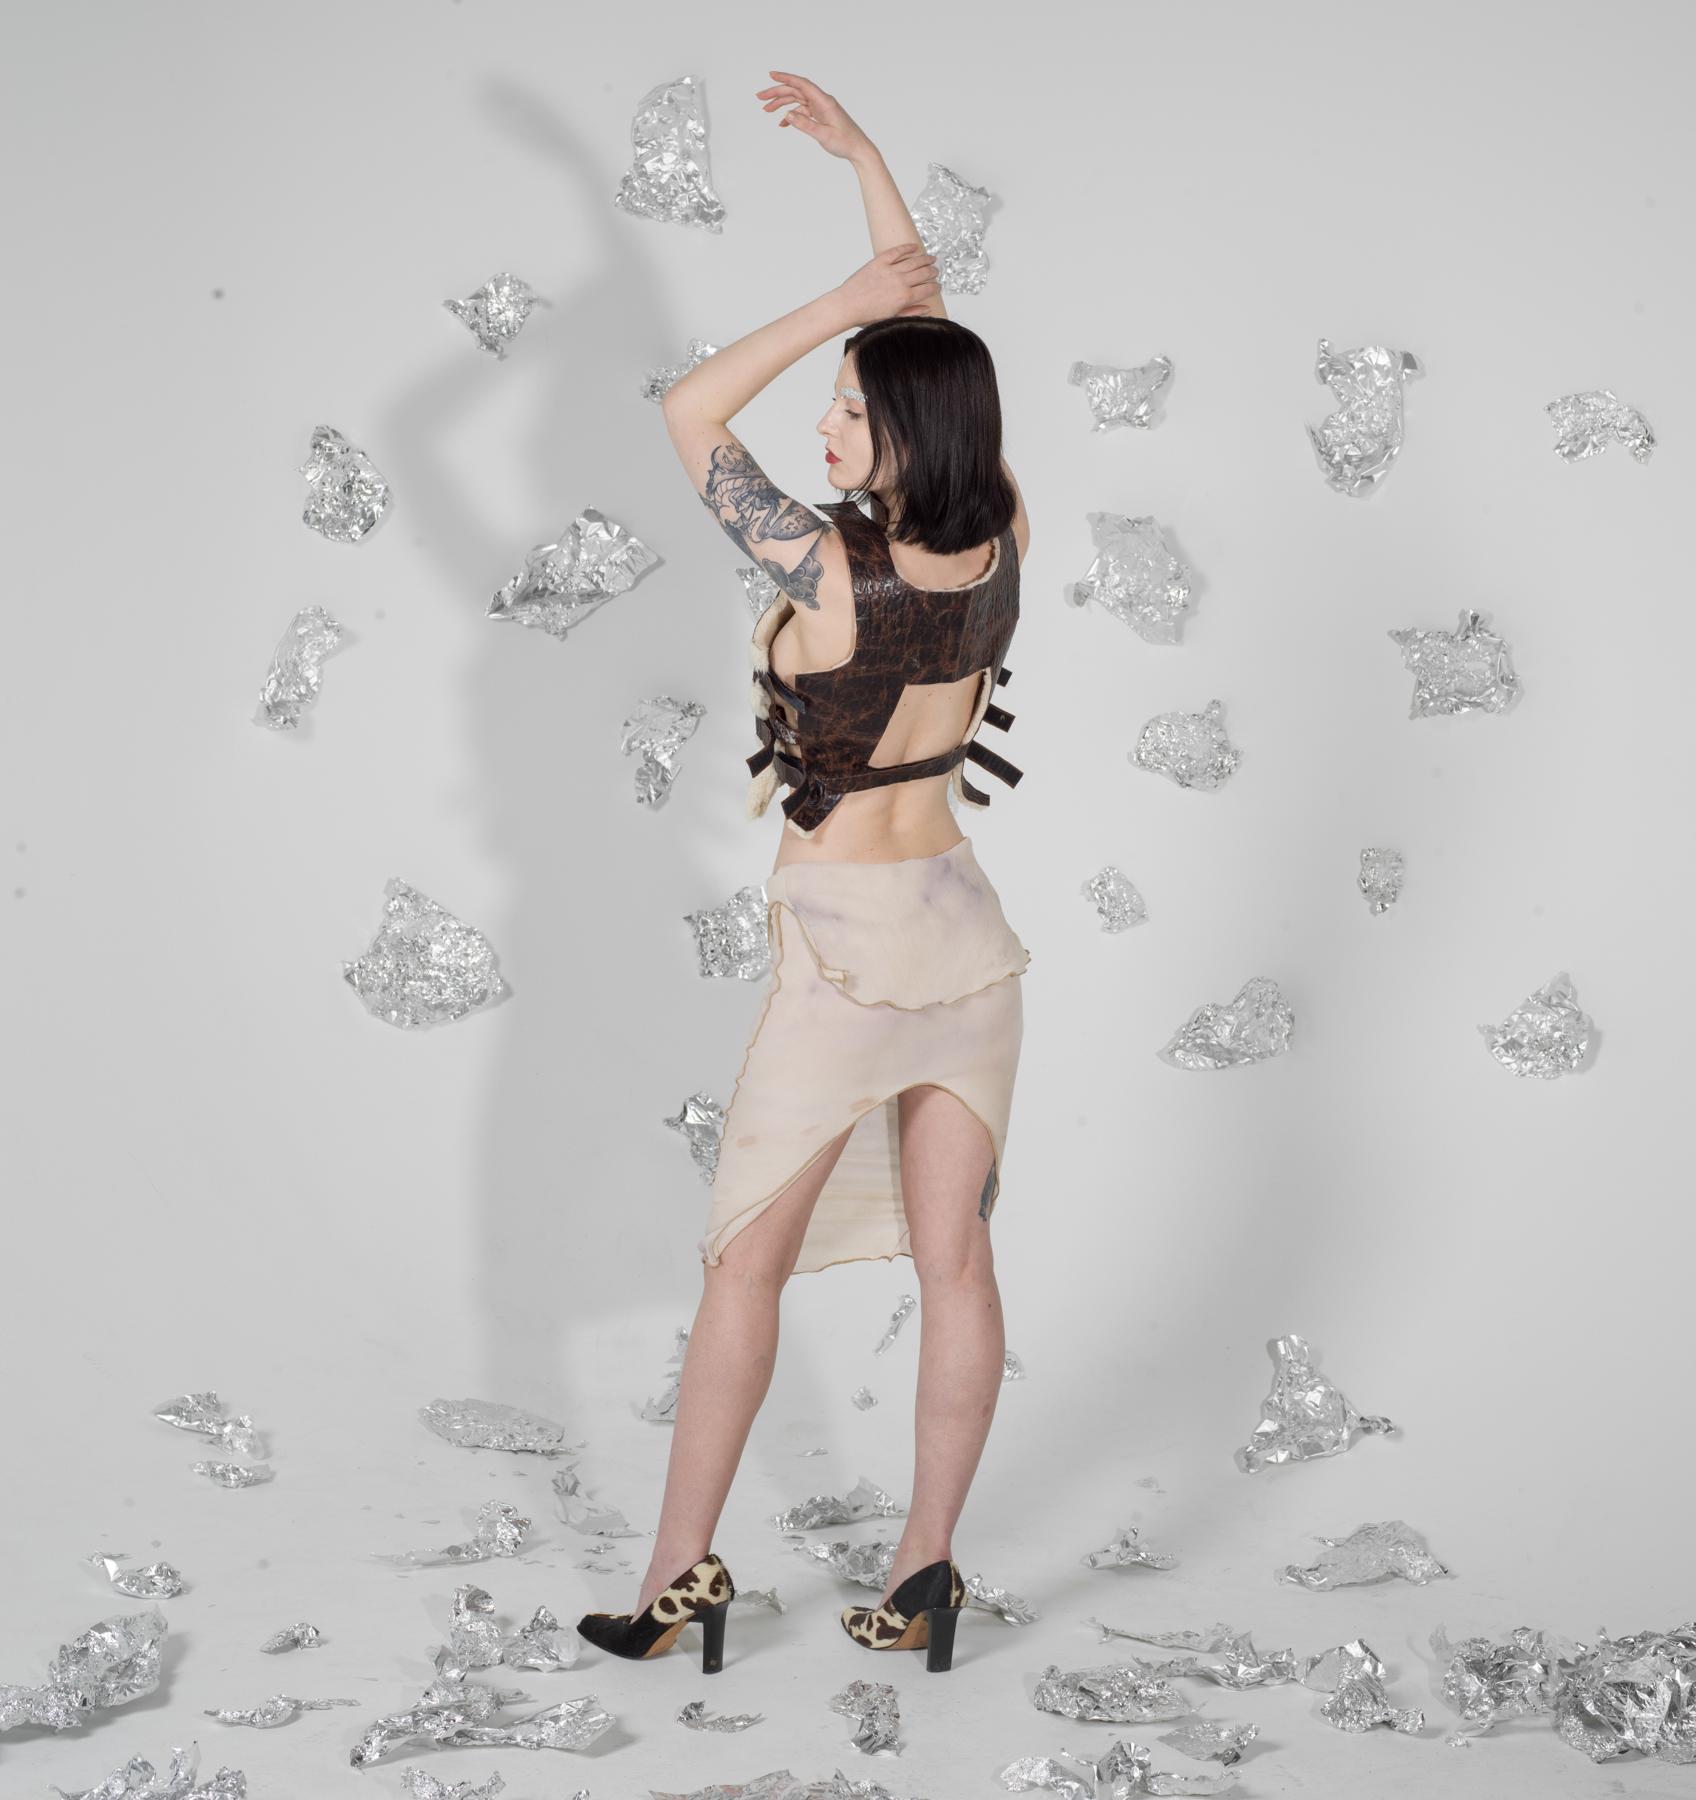 Yiyan Wang - LOOK 3 BACK